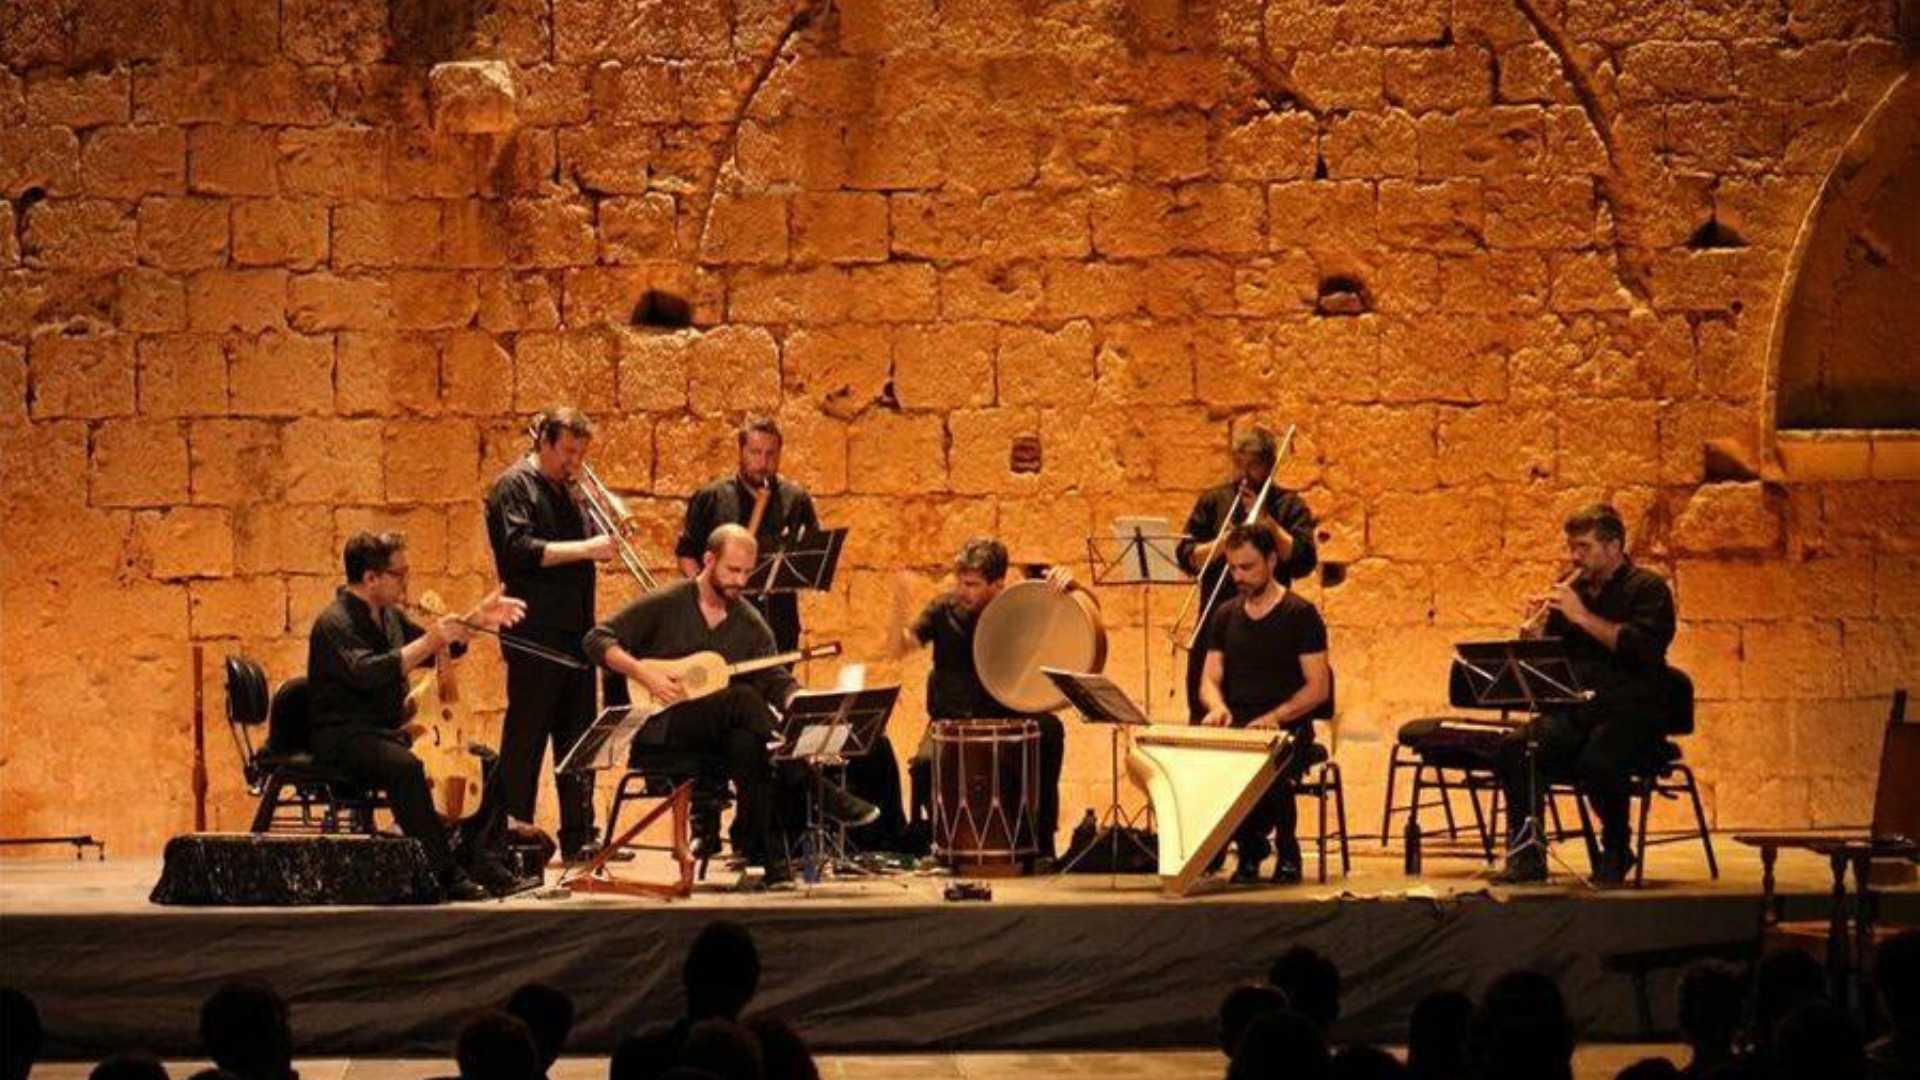 25. Antik- und Barockmusik Festival Peñíscola 2020